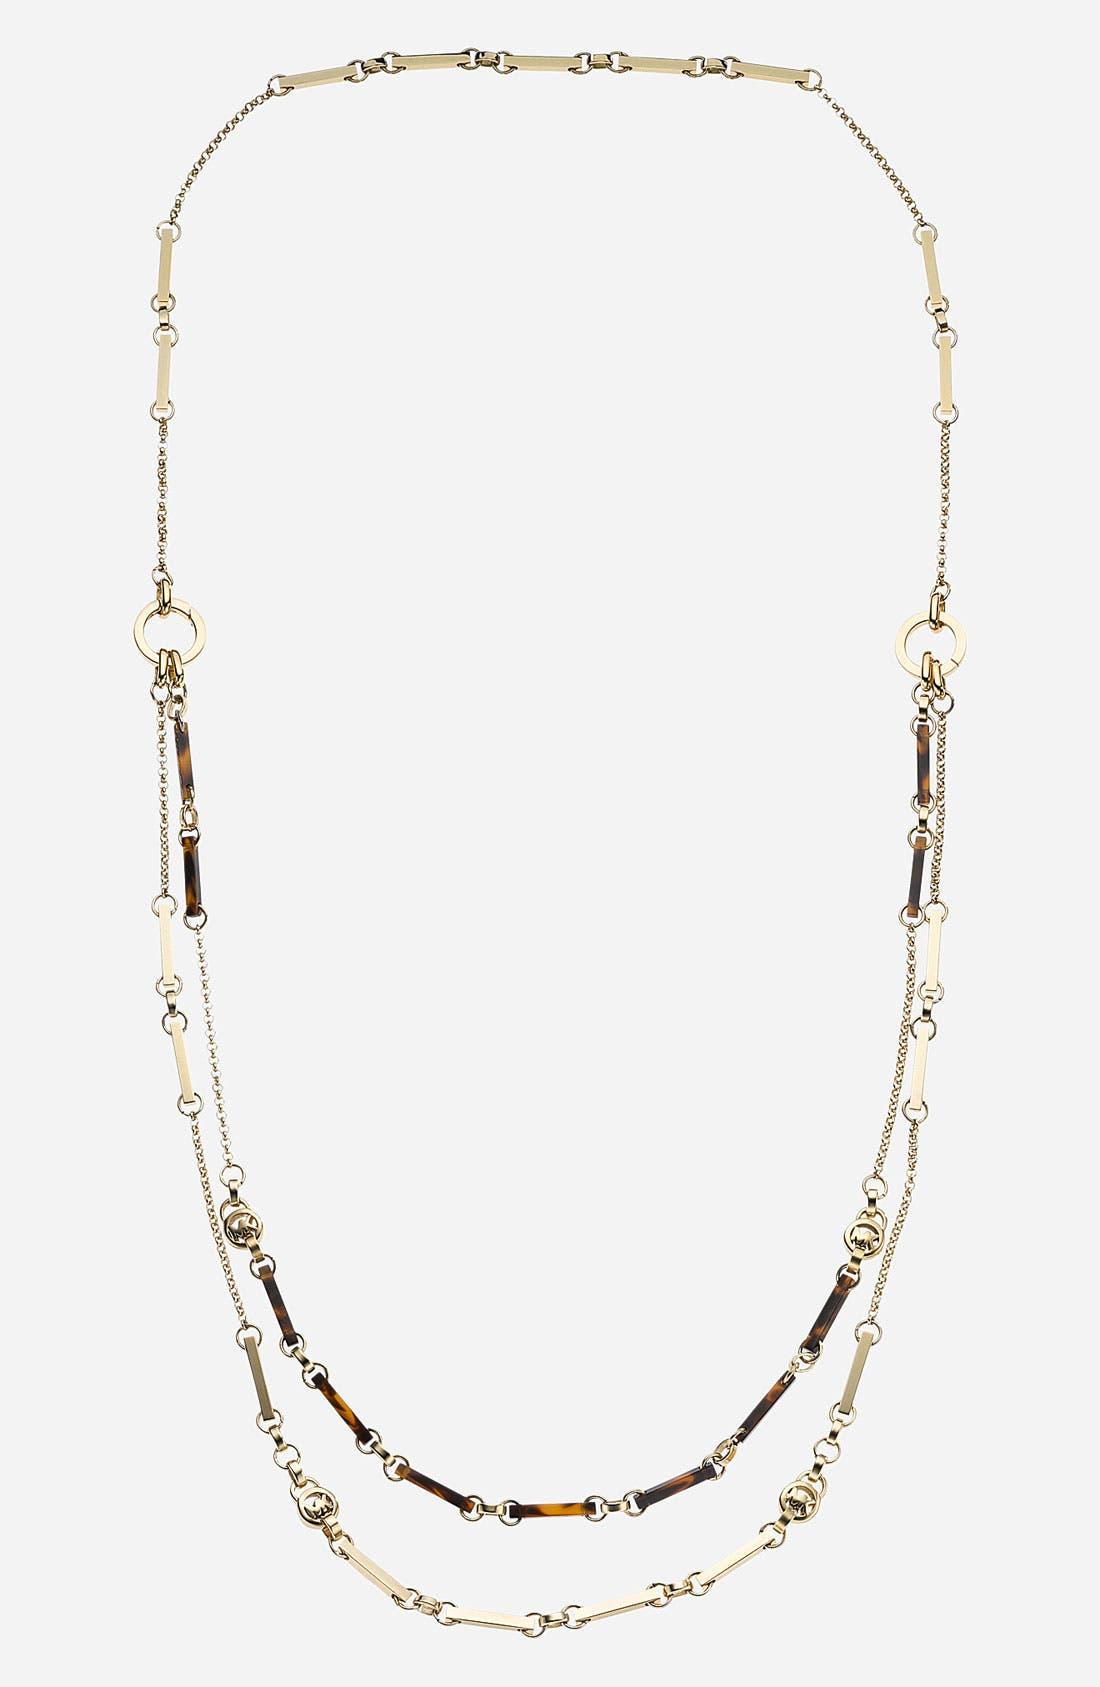 Main Image - Michael Kors 'Jet Set' Convertible Necklace